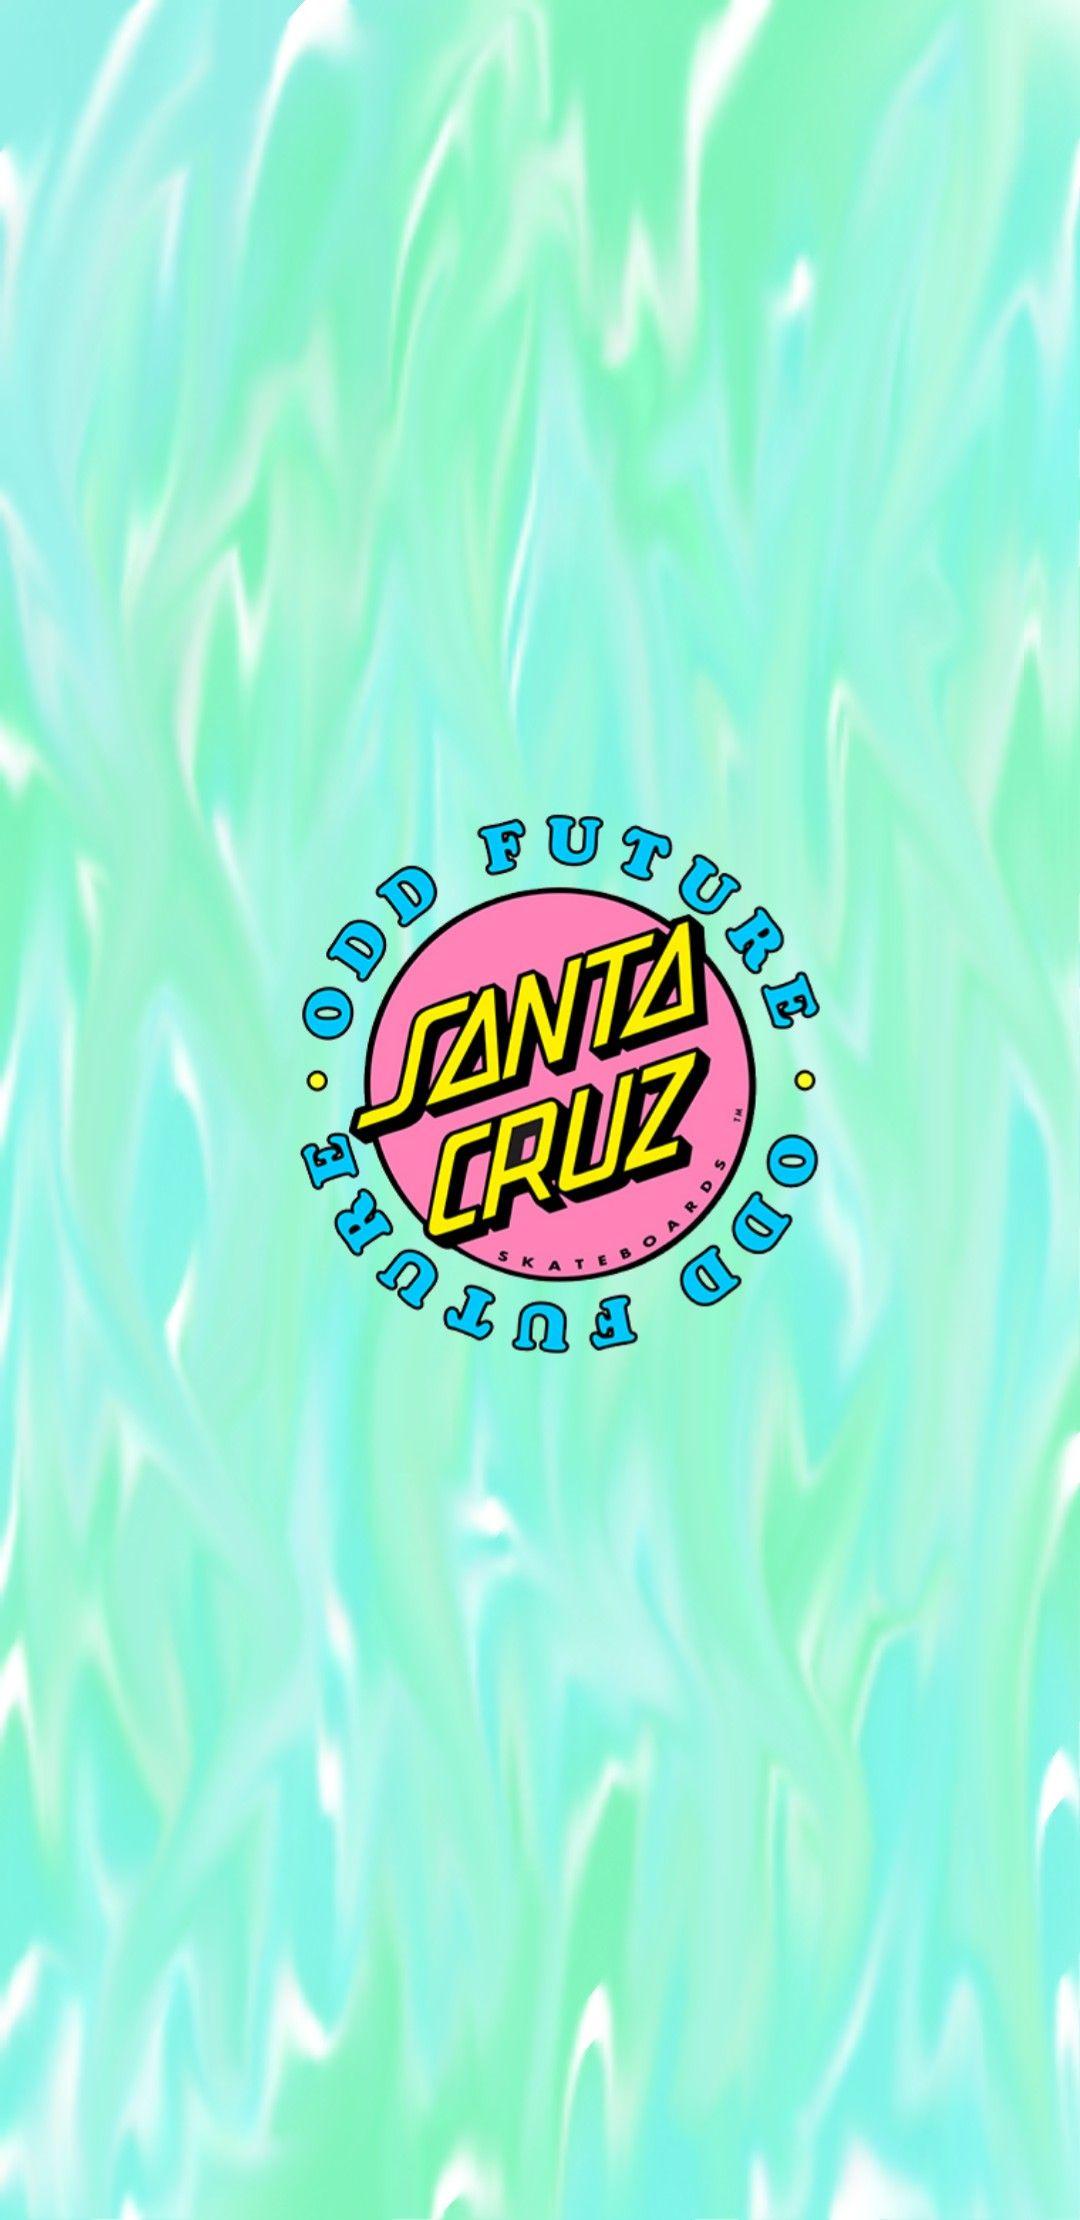 Santa Cruz Iphone Wallpaper Logo Hype Wallpaper Hippie Wallpaper